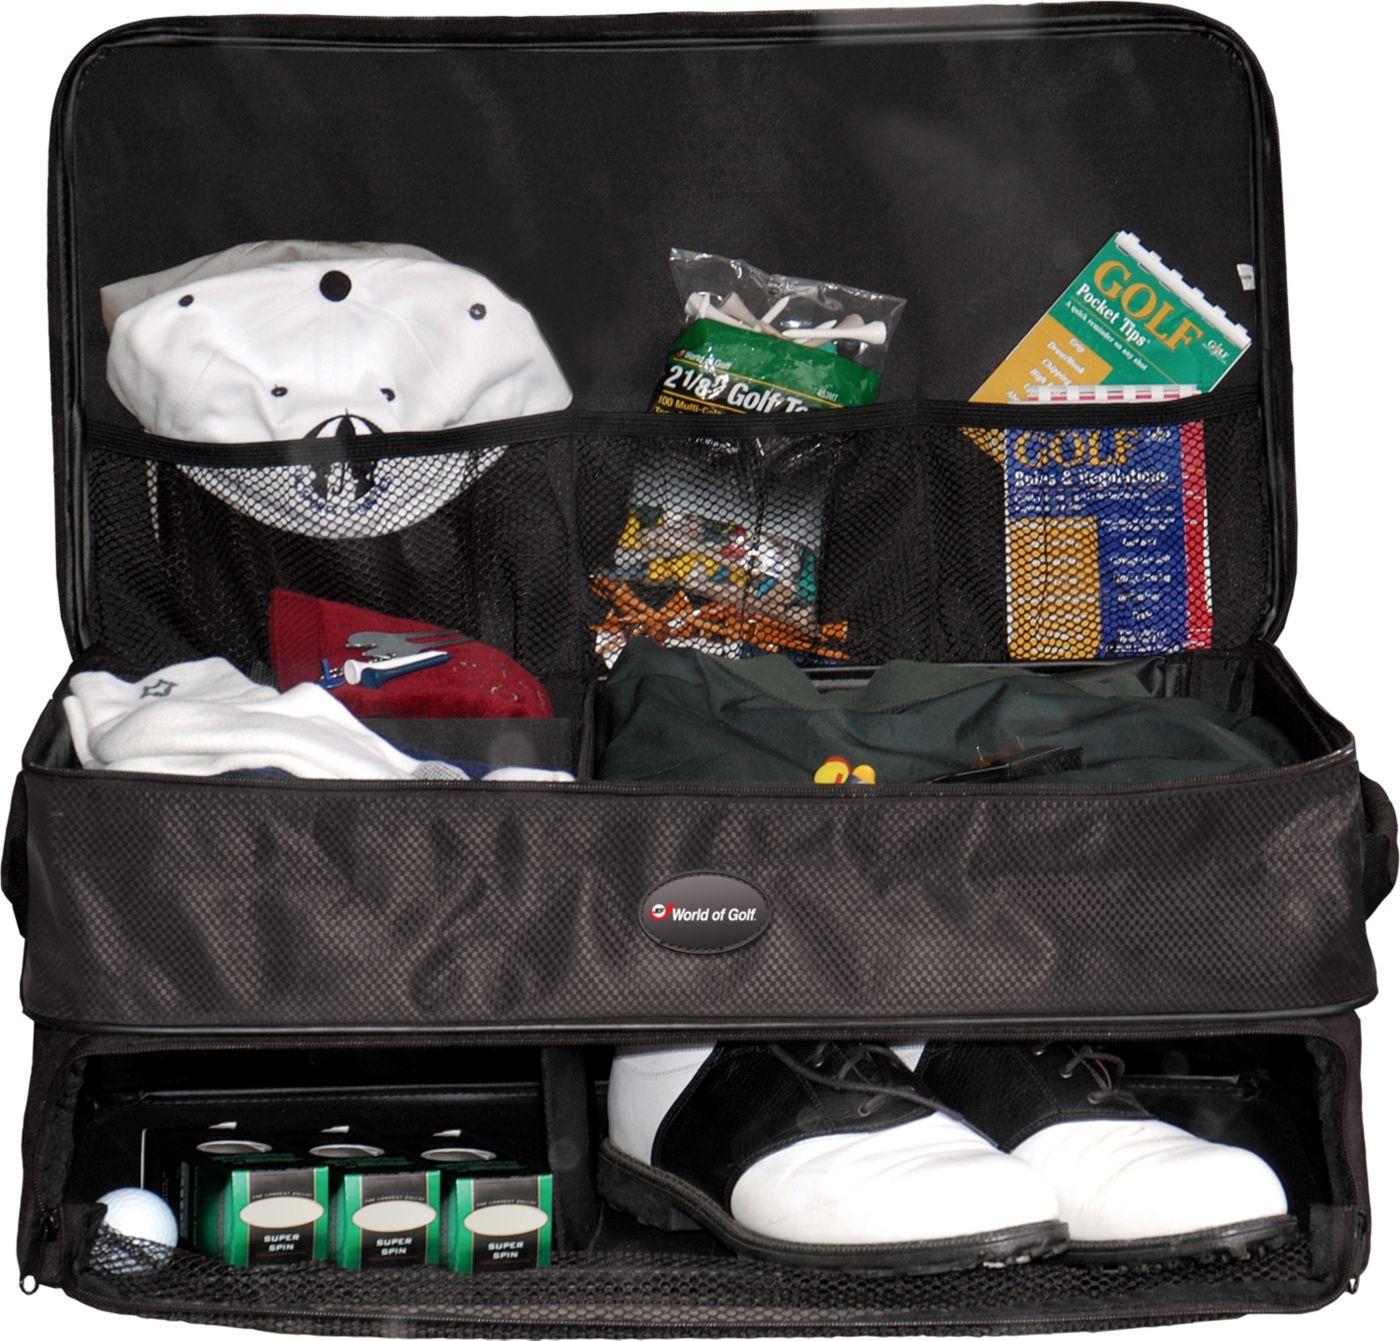 Golf Gifts & Gallery Trunk Organizer